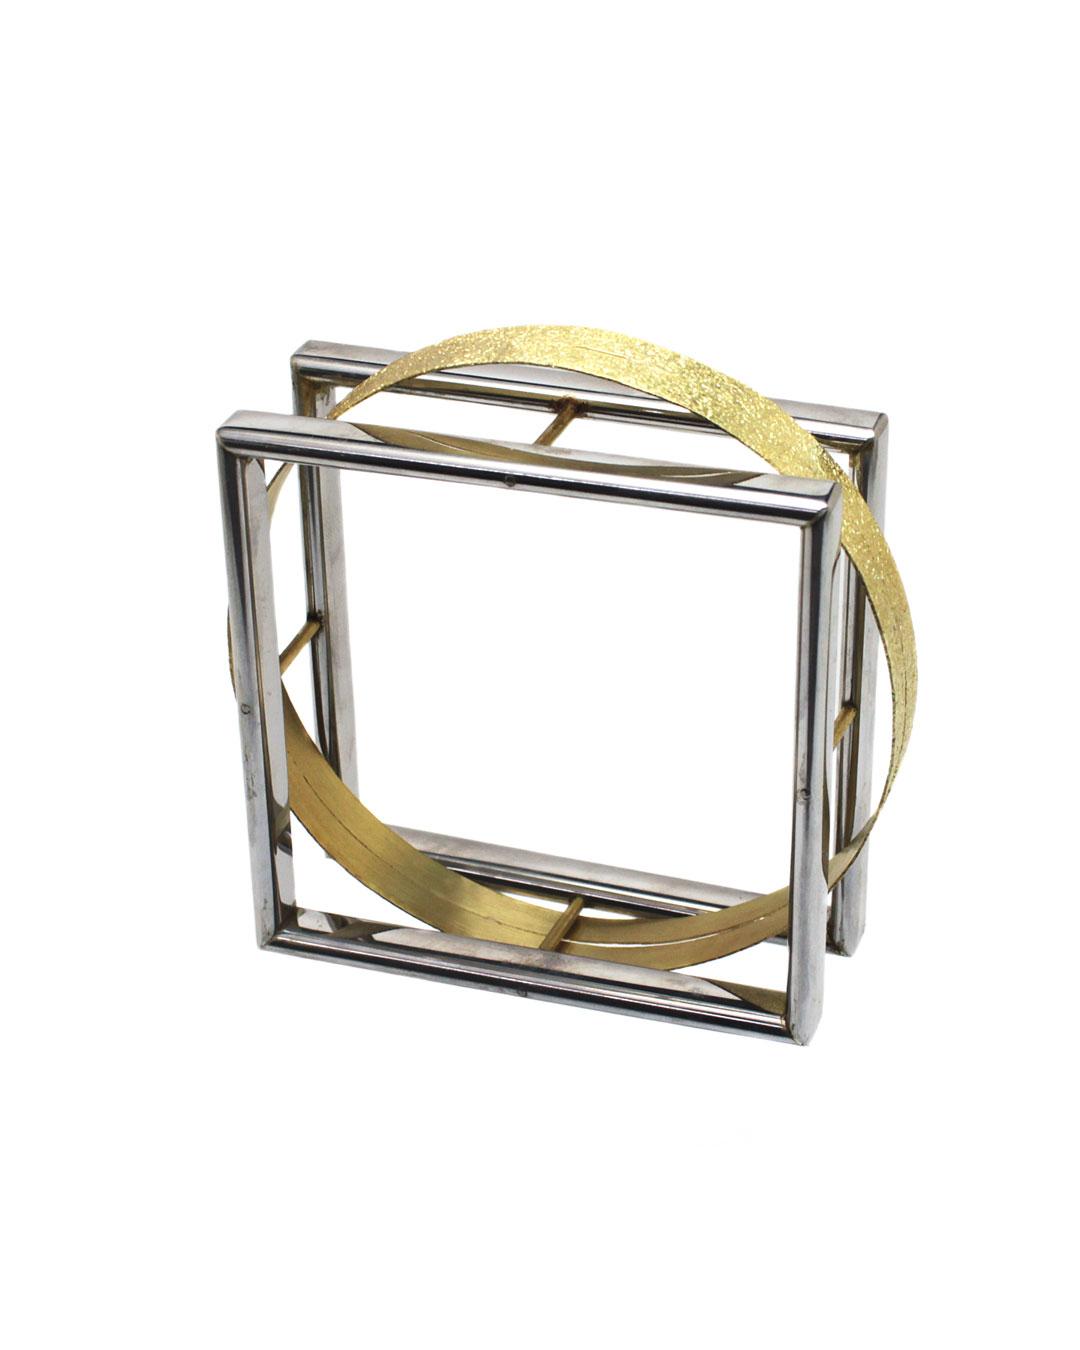 Okinari Kurokawa, untitled, 2014, bracelet, 20ct gold, stainless steel, 75 x 75 x 26 mm